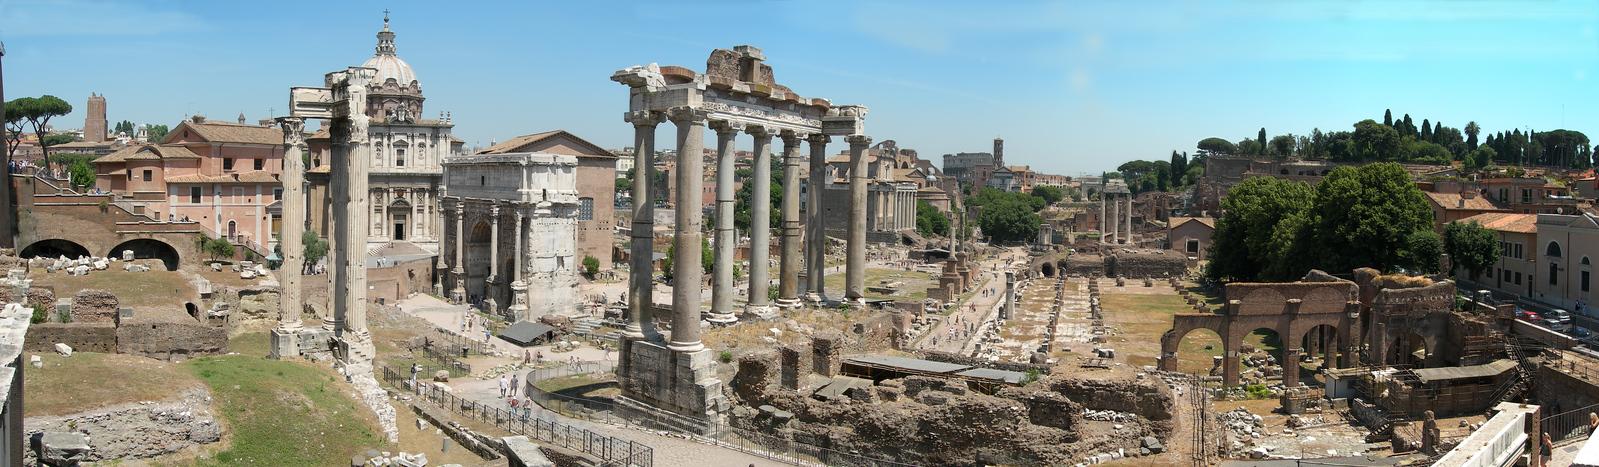 Roma - Rome